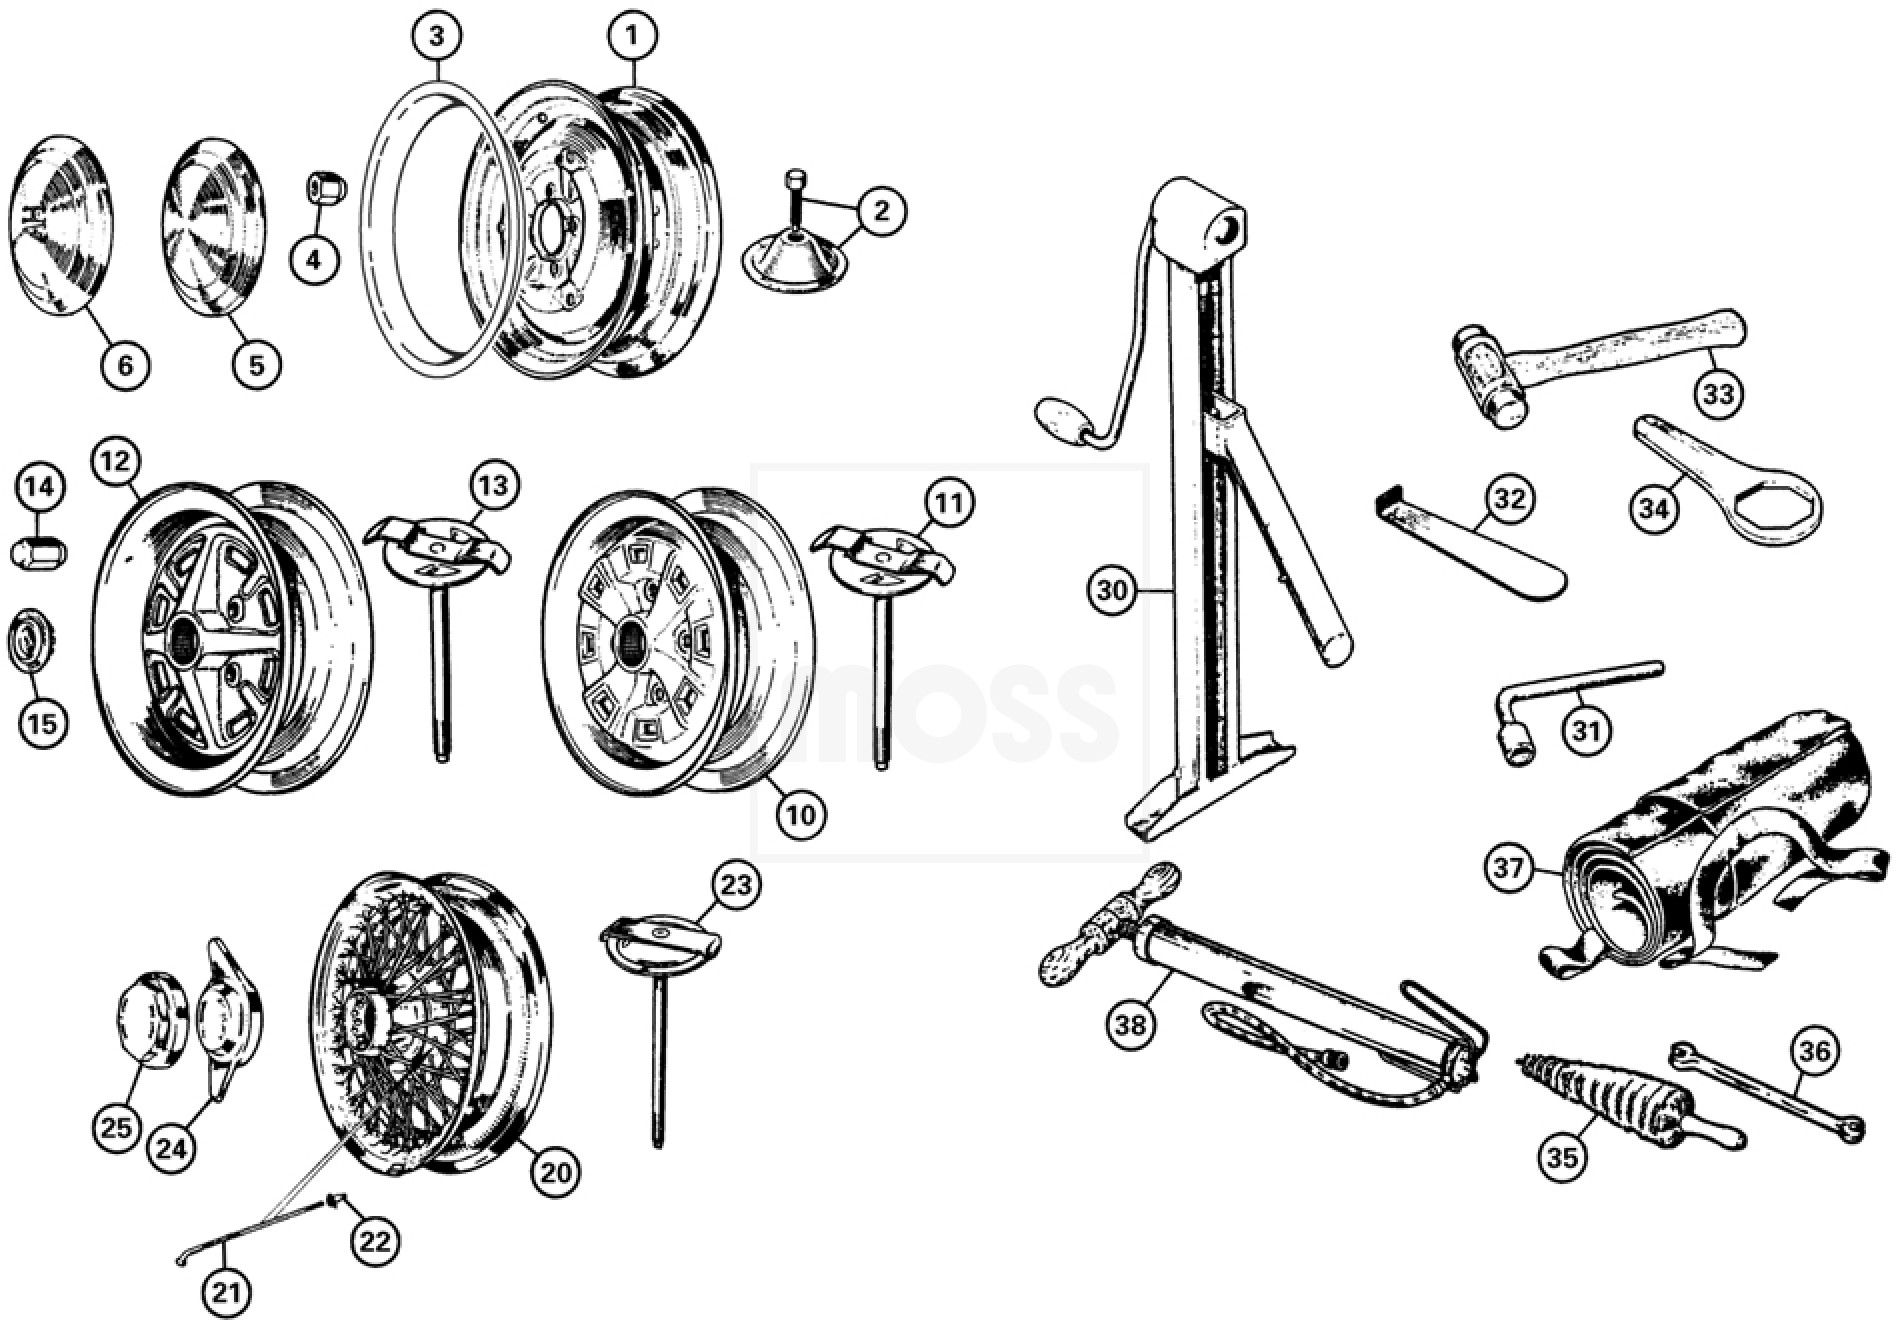 Road Wheels & Fittings: Sprite & Midget 1275-1500cc